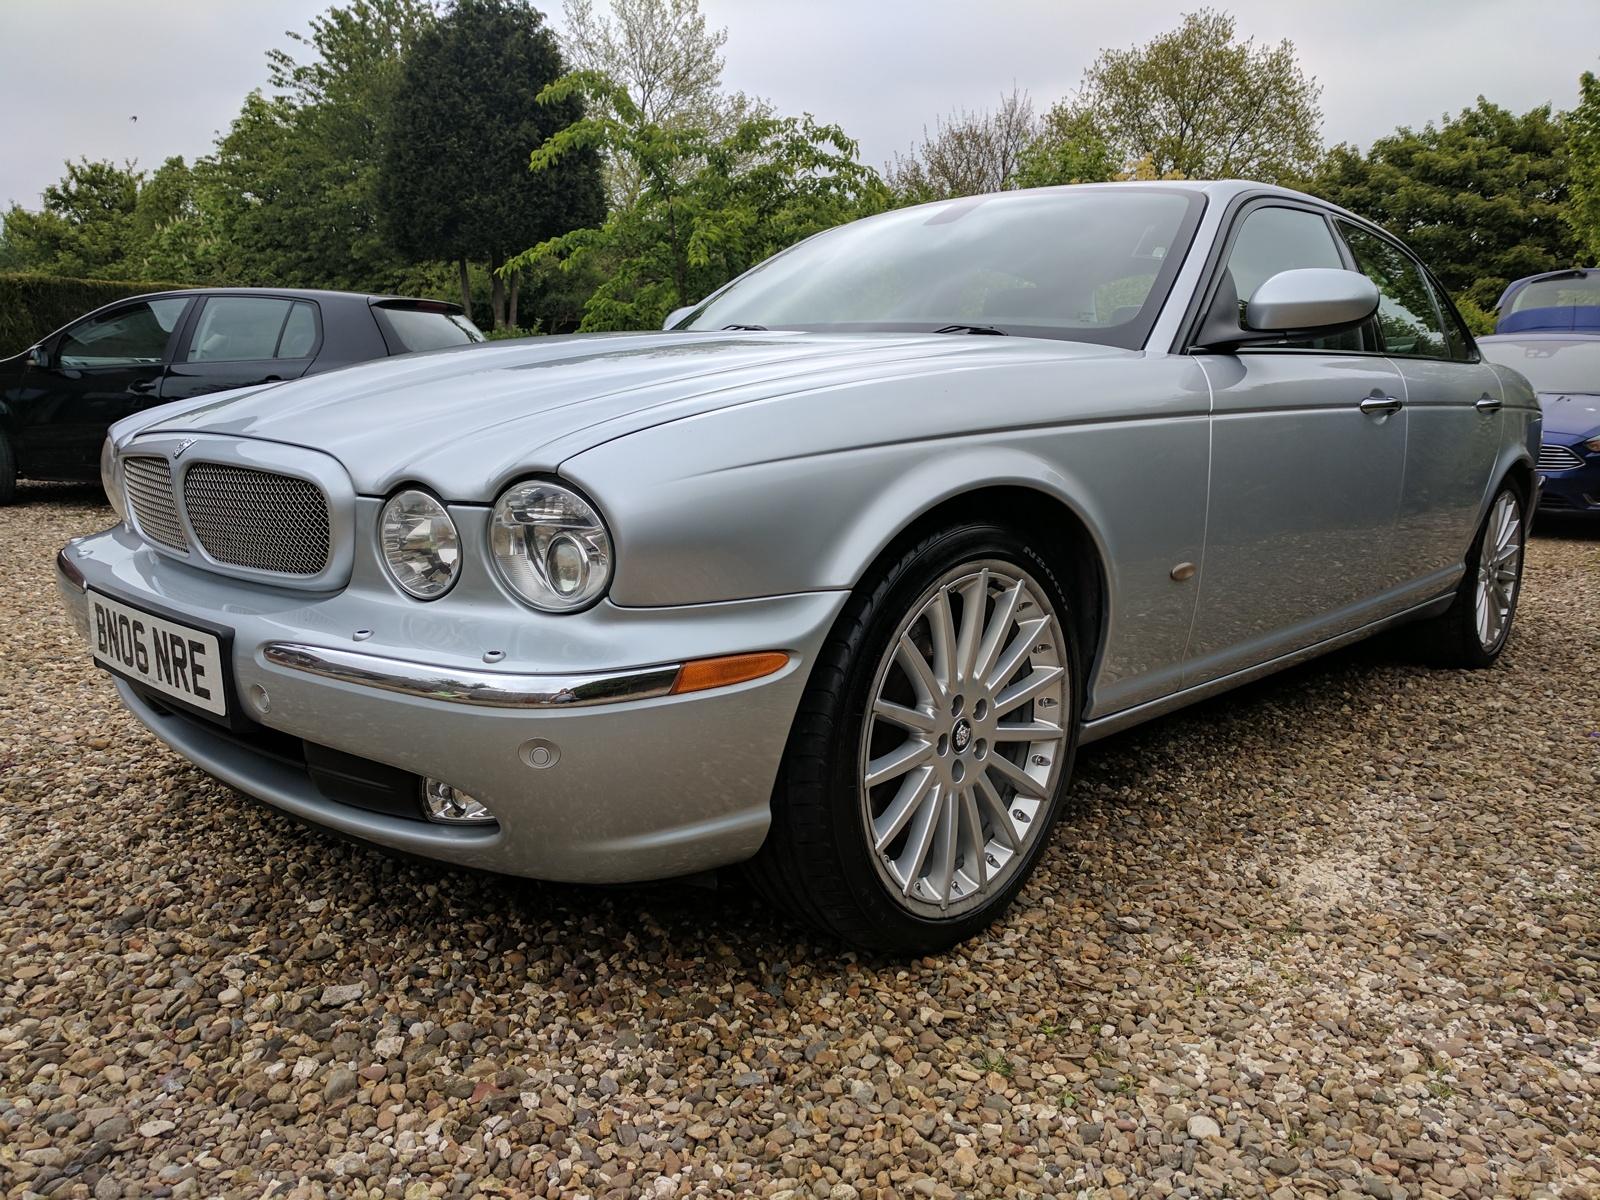 Gorgeous XJR X350 For Sale. 2006. - Jaguars For Sale ...